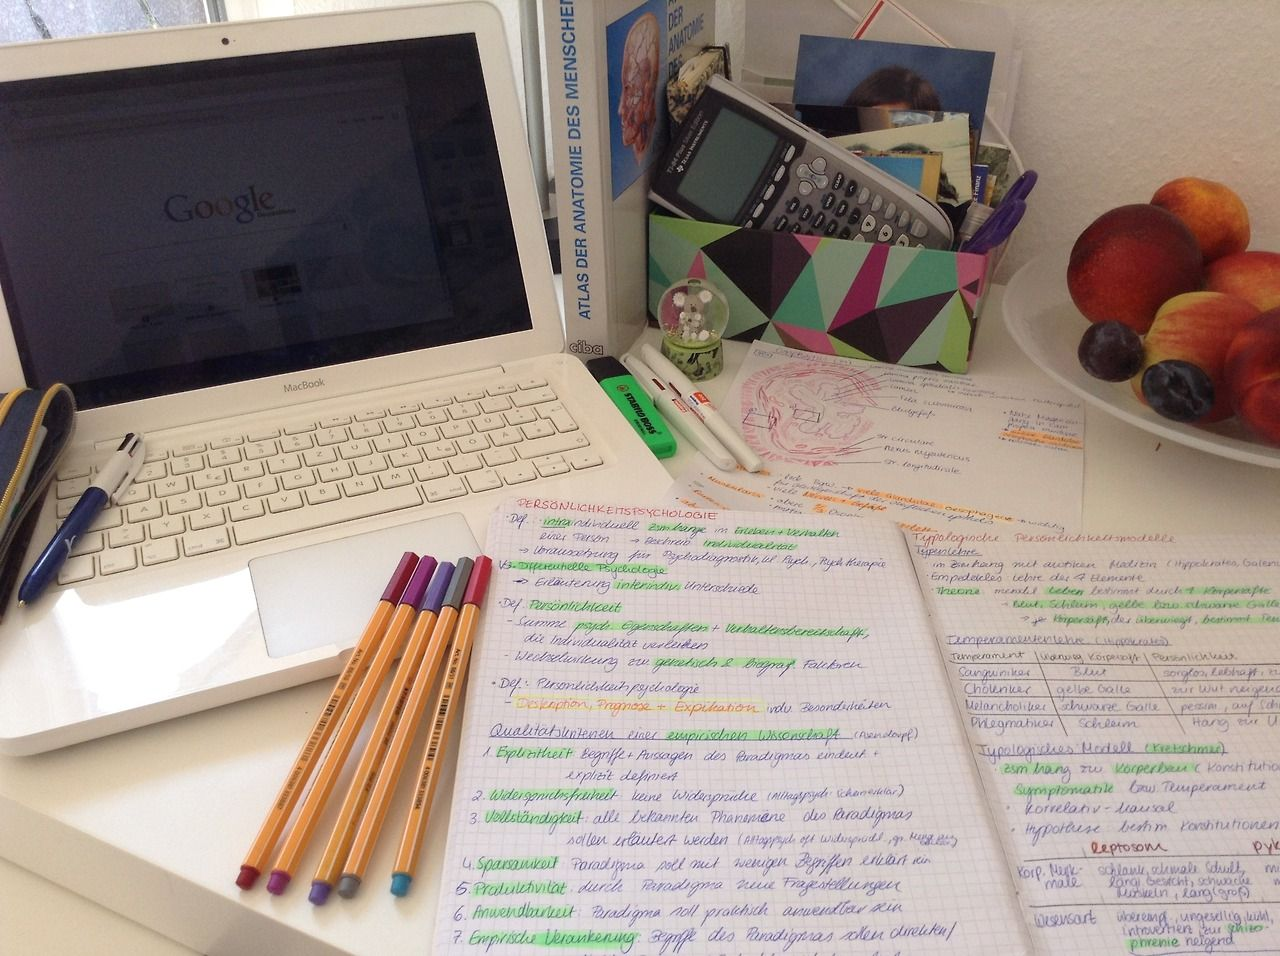 Study-Hack : Photo | Study/classes & more | Pinterest | Study hacks